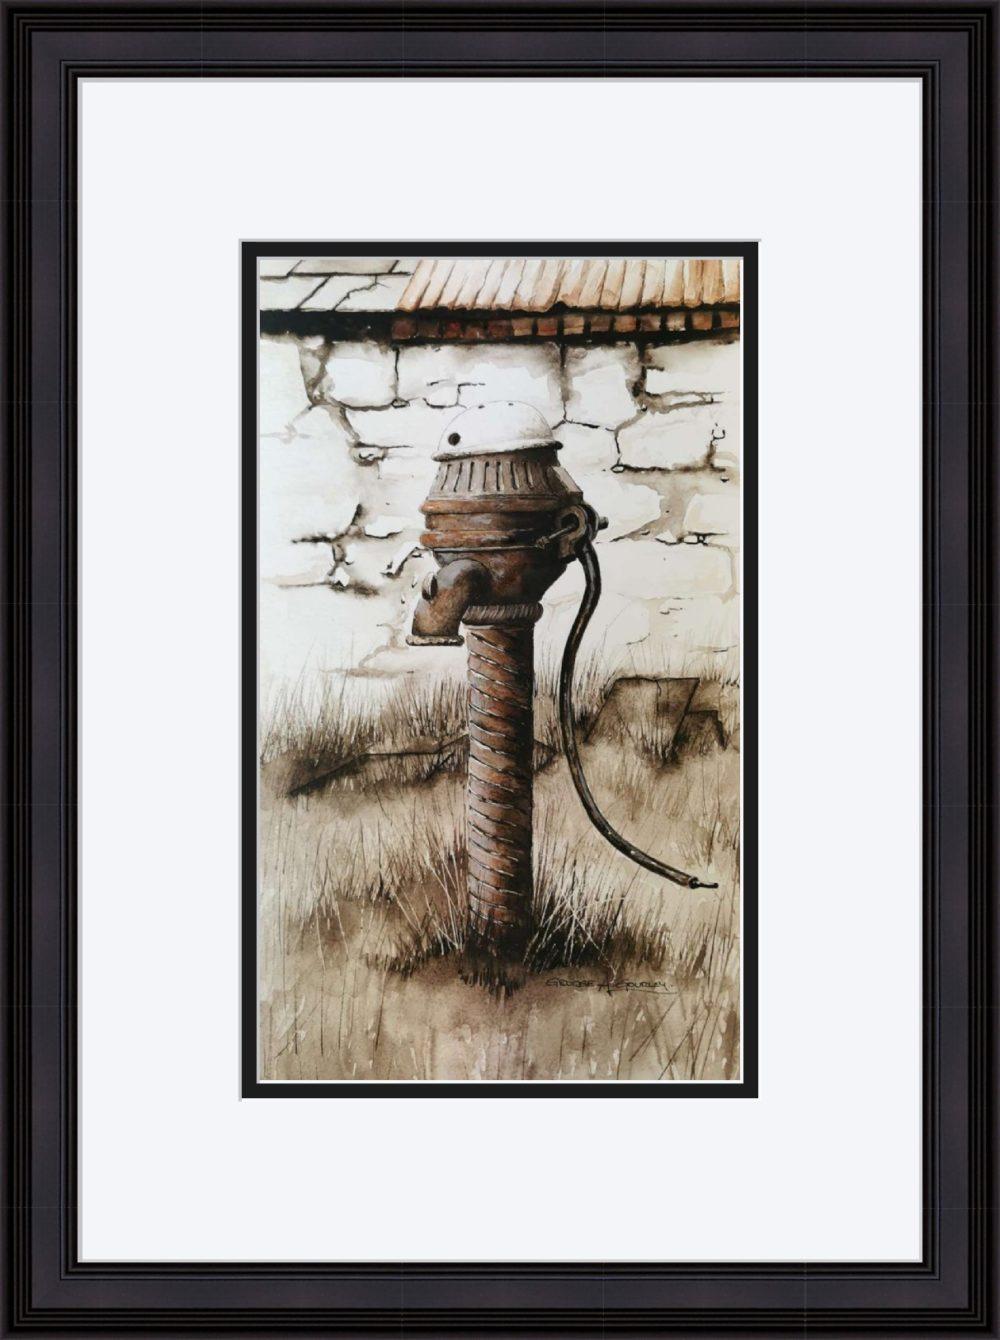 The Old Pump in Black Frame